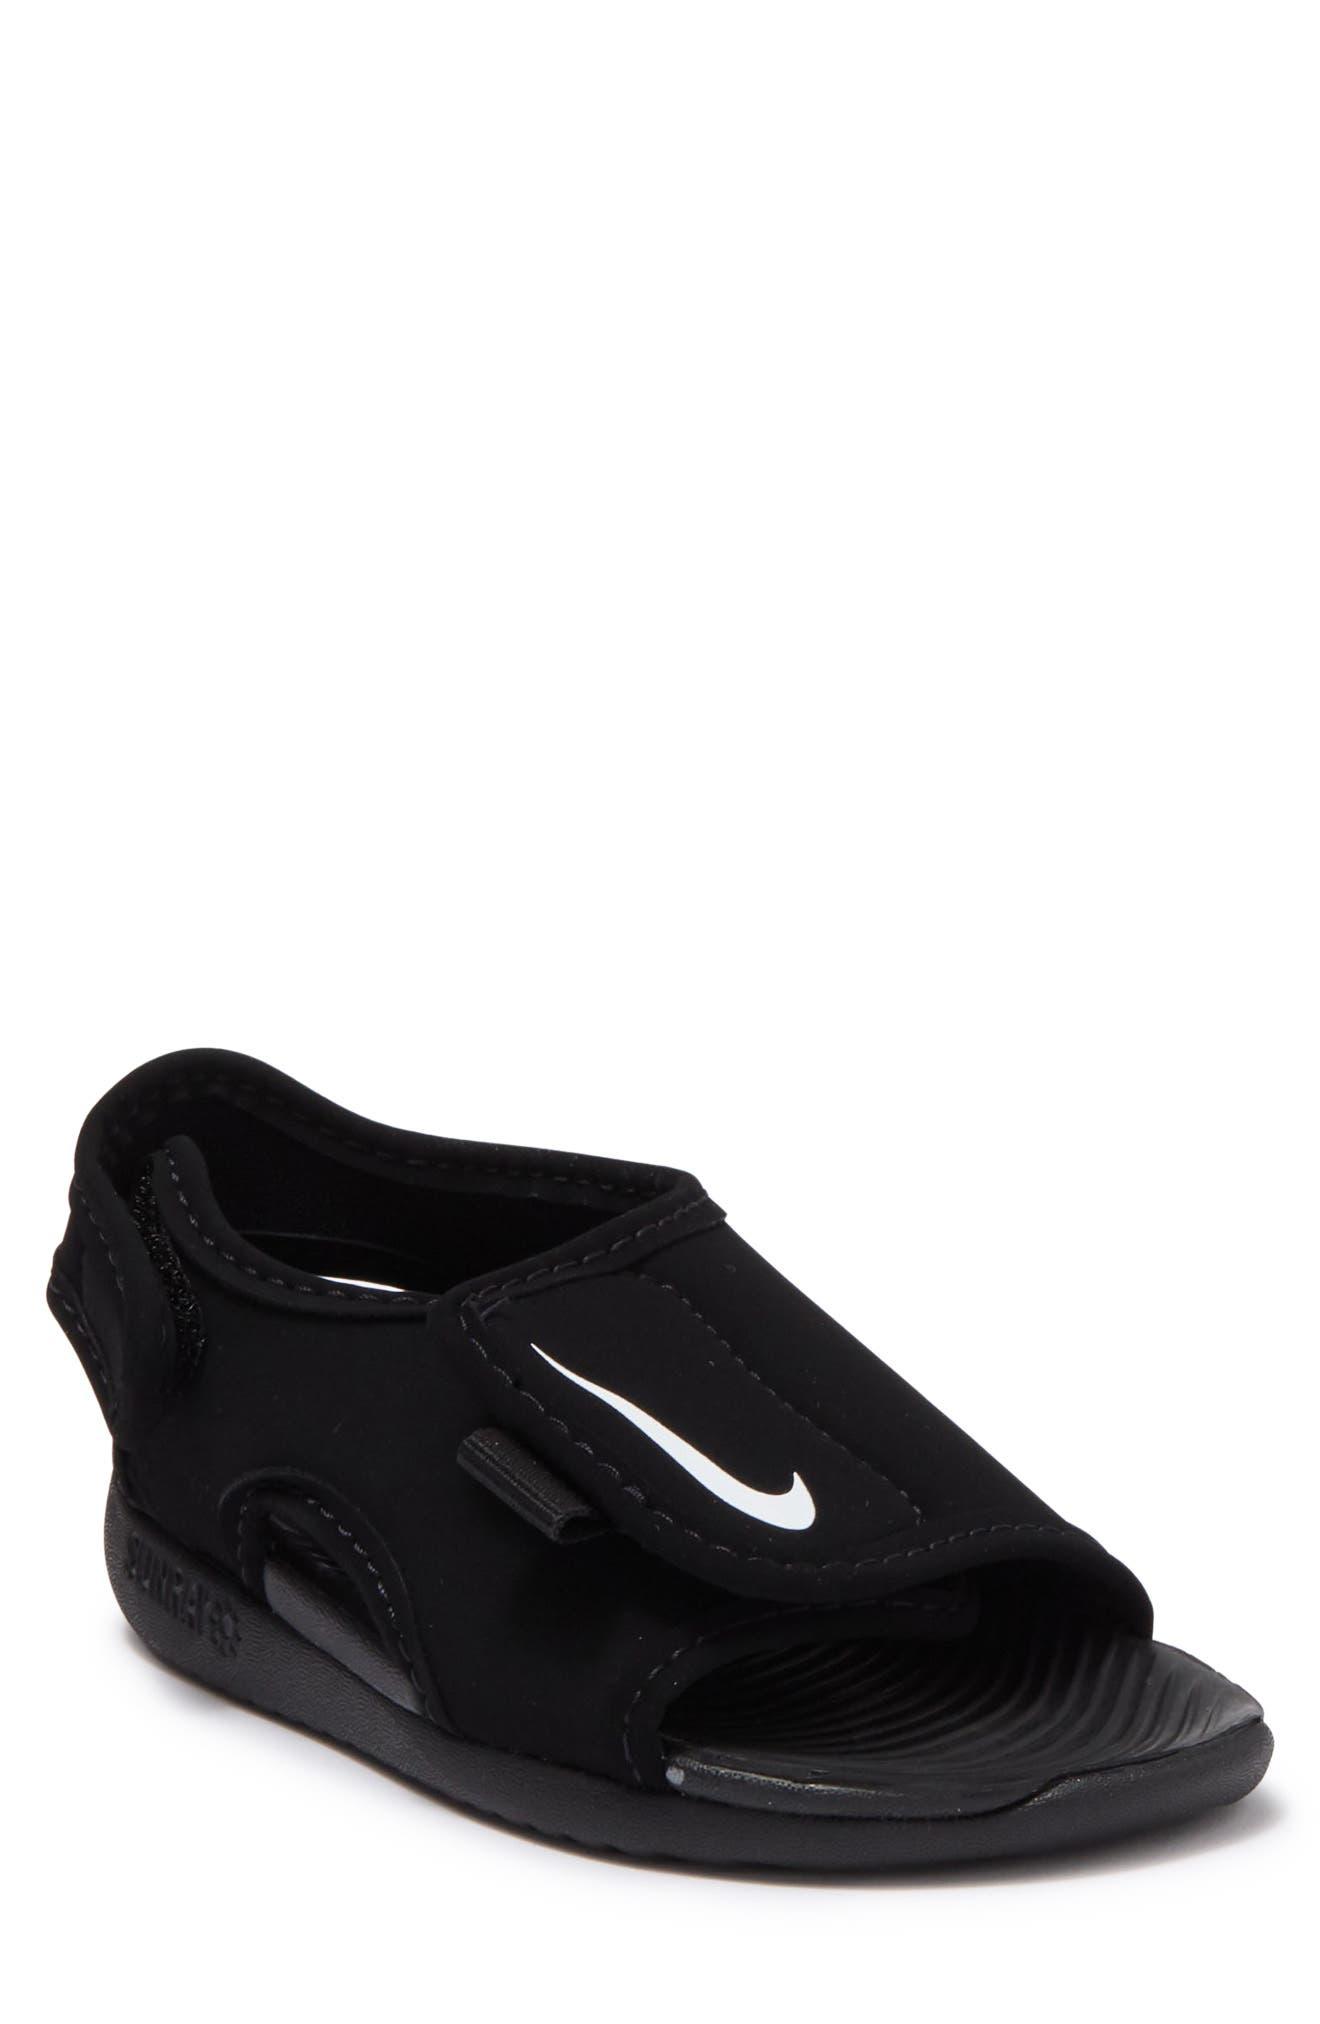 Image of Nike Sunray Adjust 5 V2 Sandal